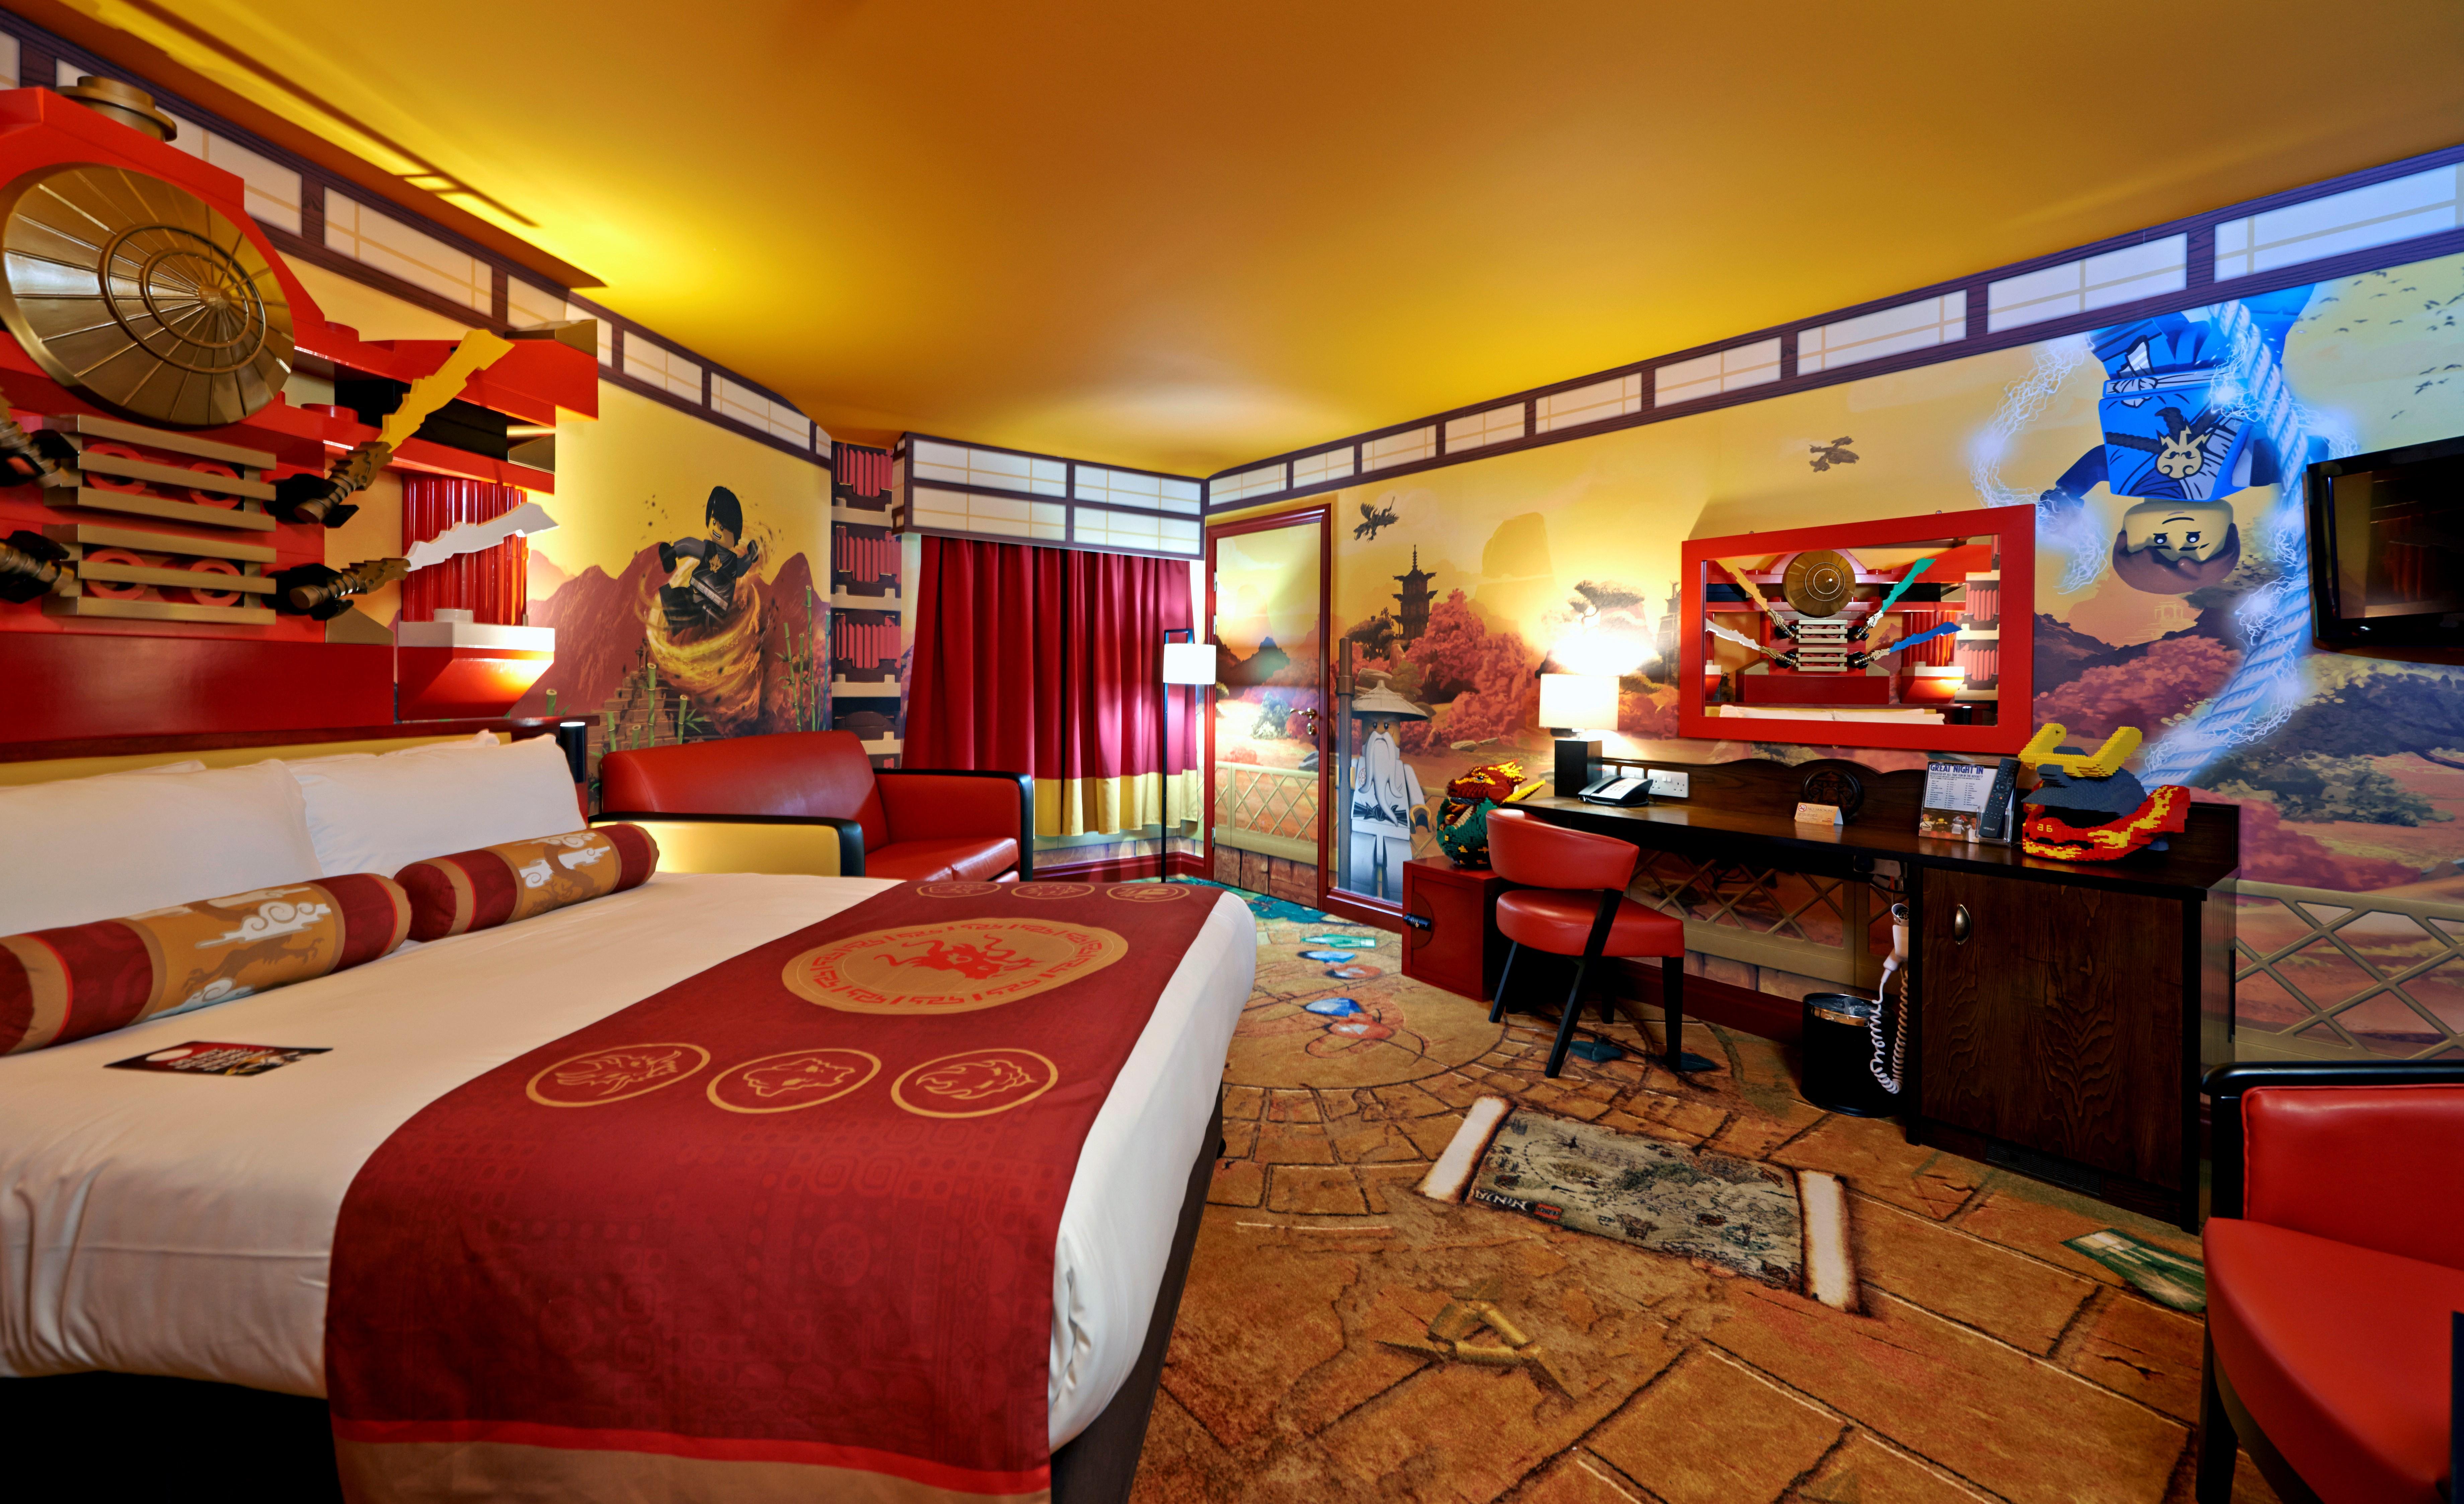 Windsor Casino Hotel Rooms